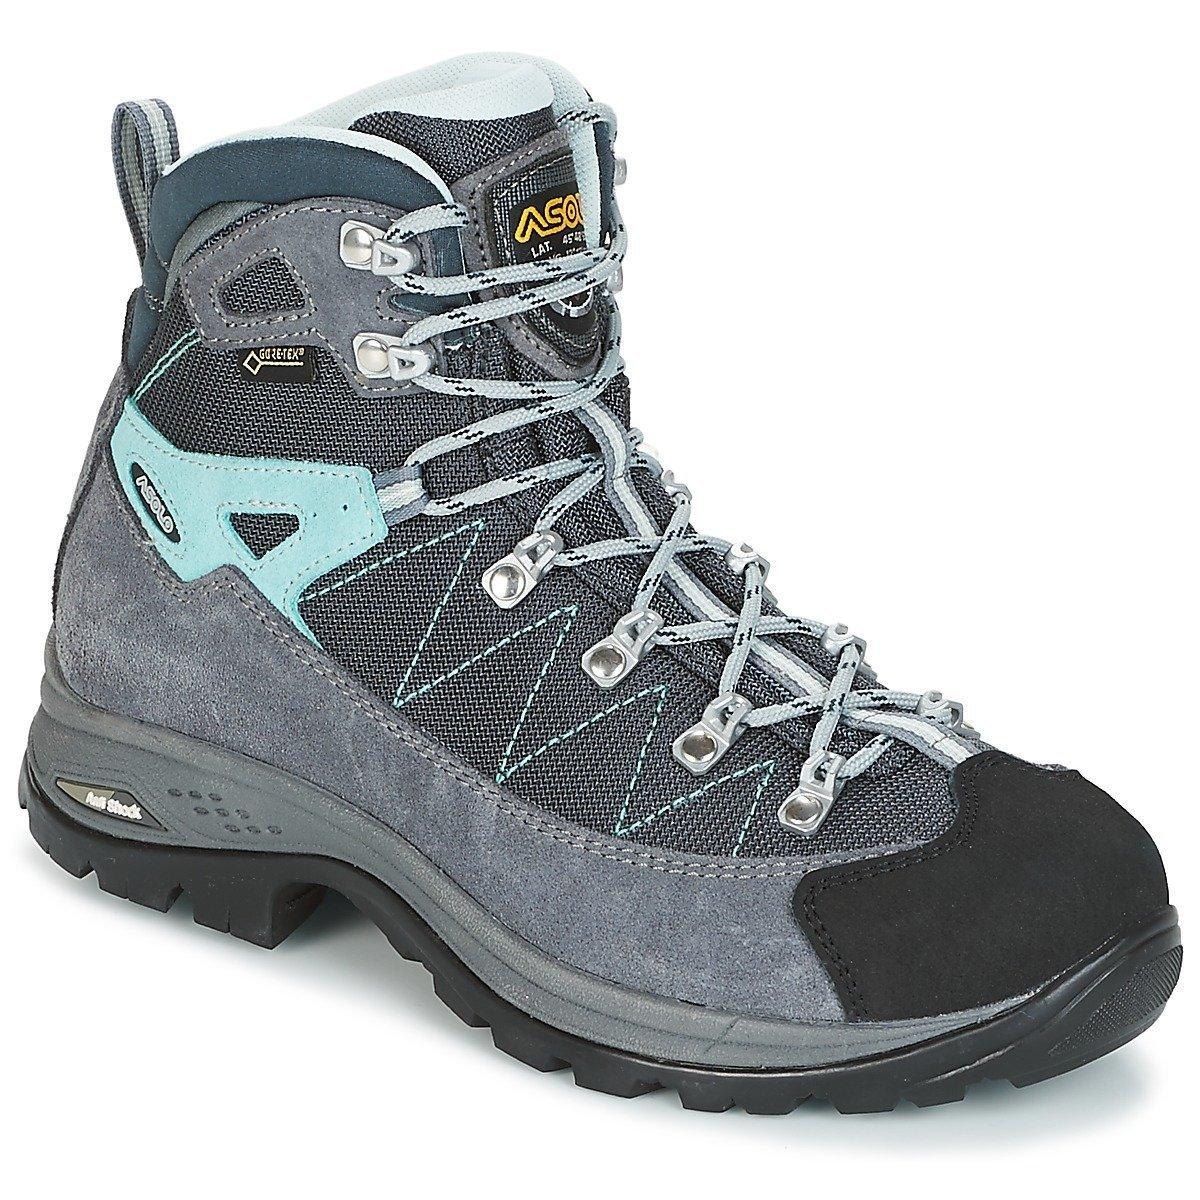 fc6ed70af11 Details about Asolo Finder GV ML, Shoe Walk Woman